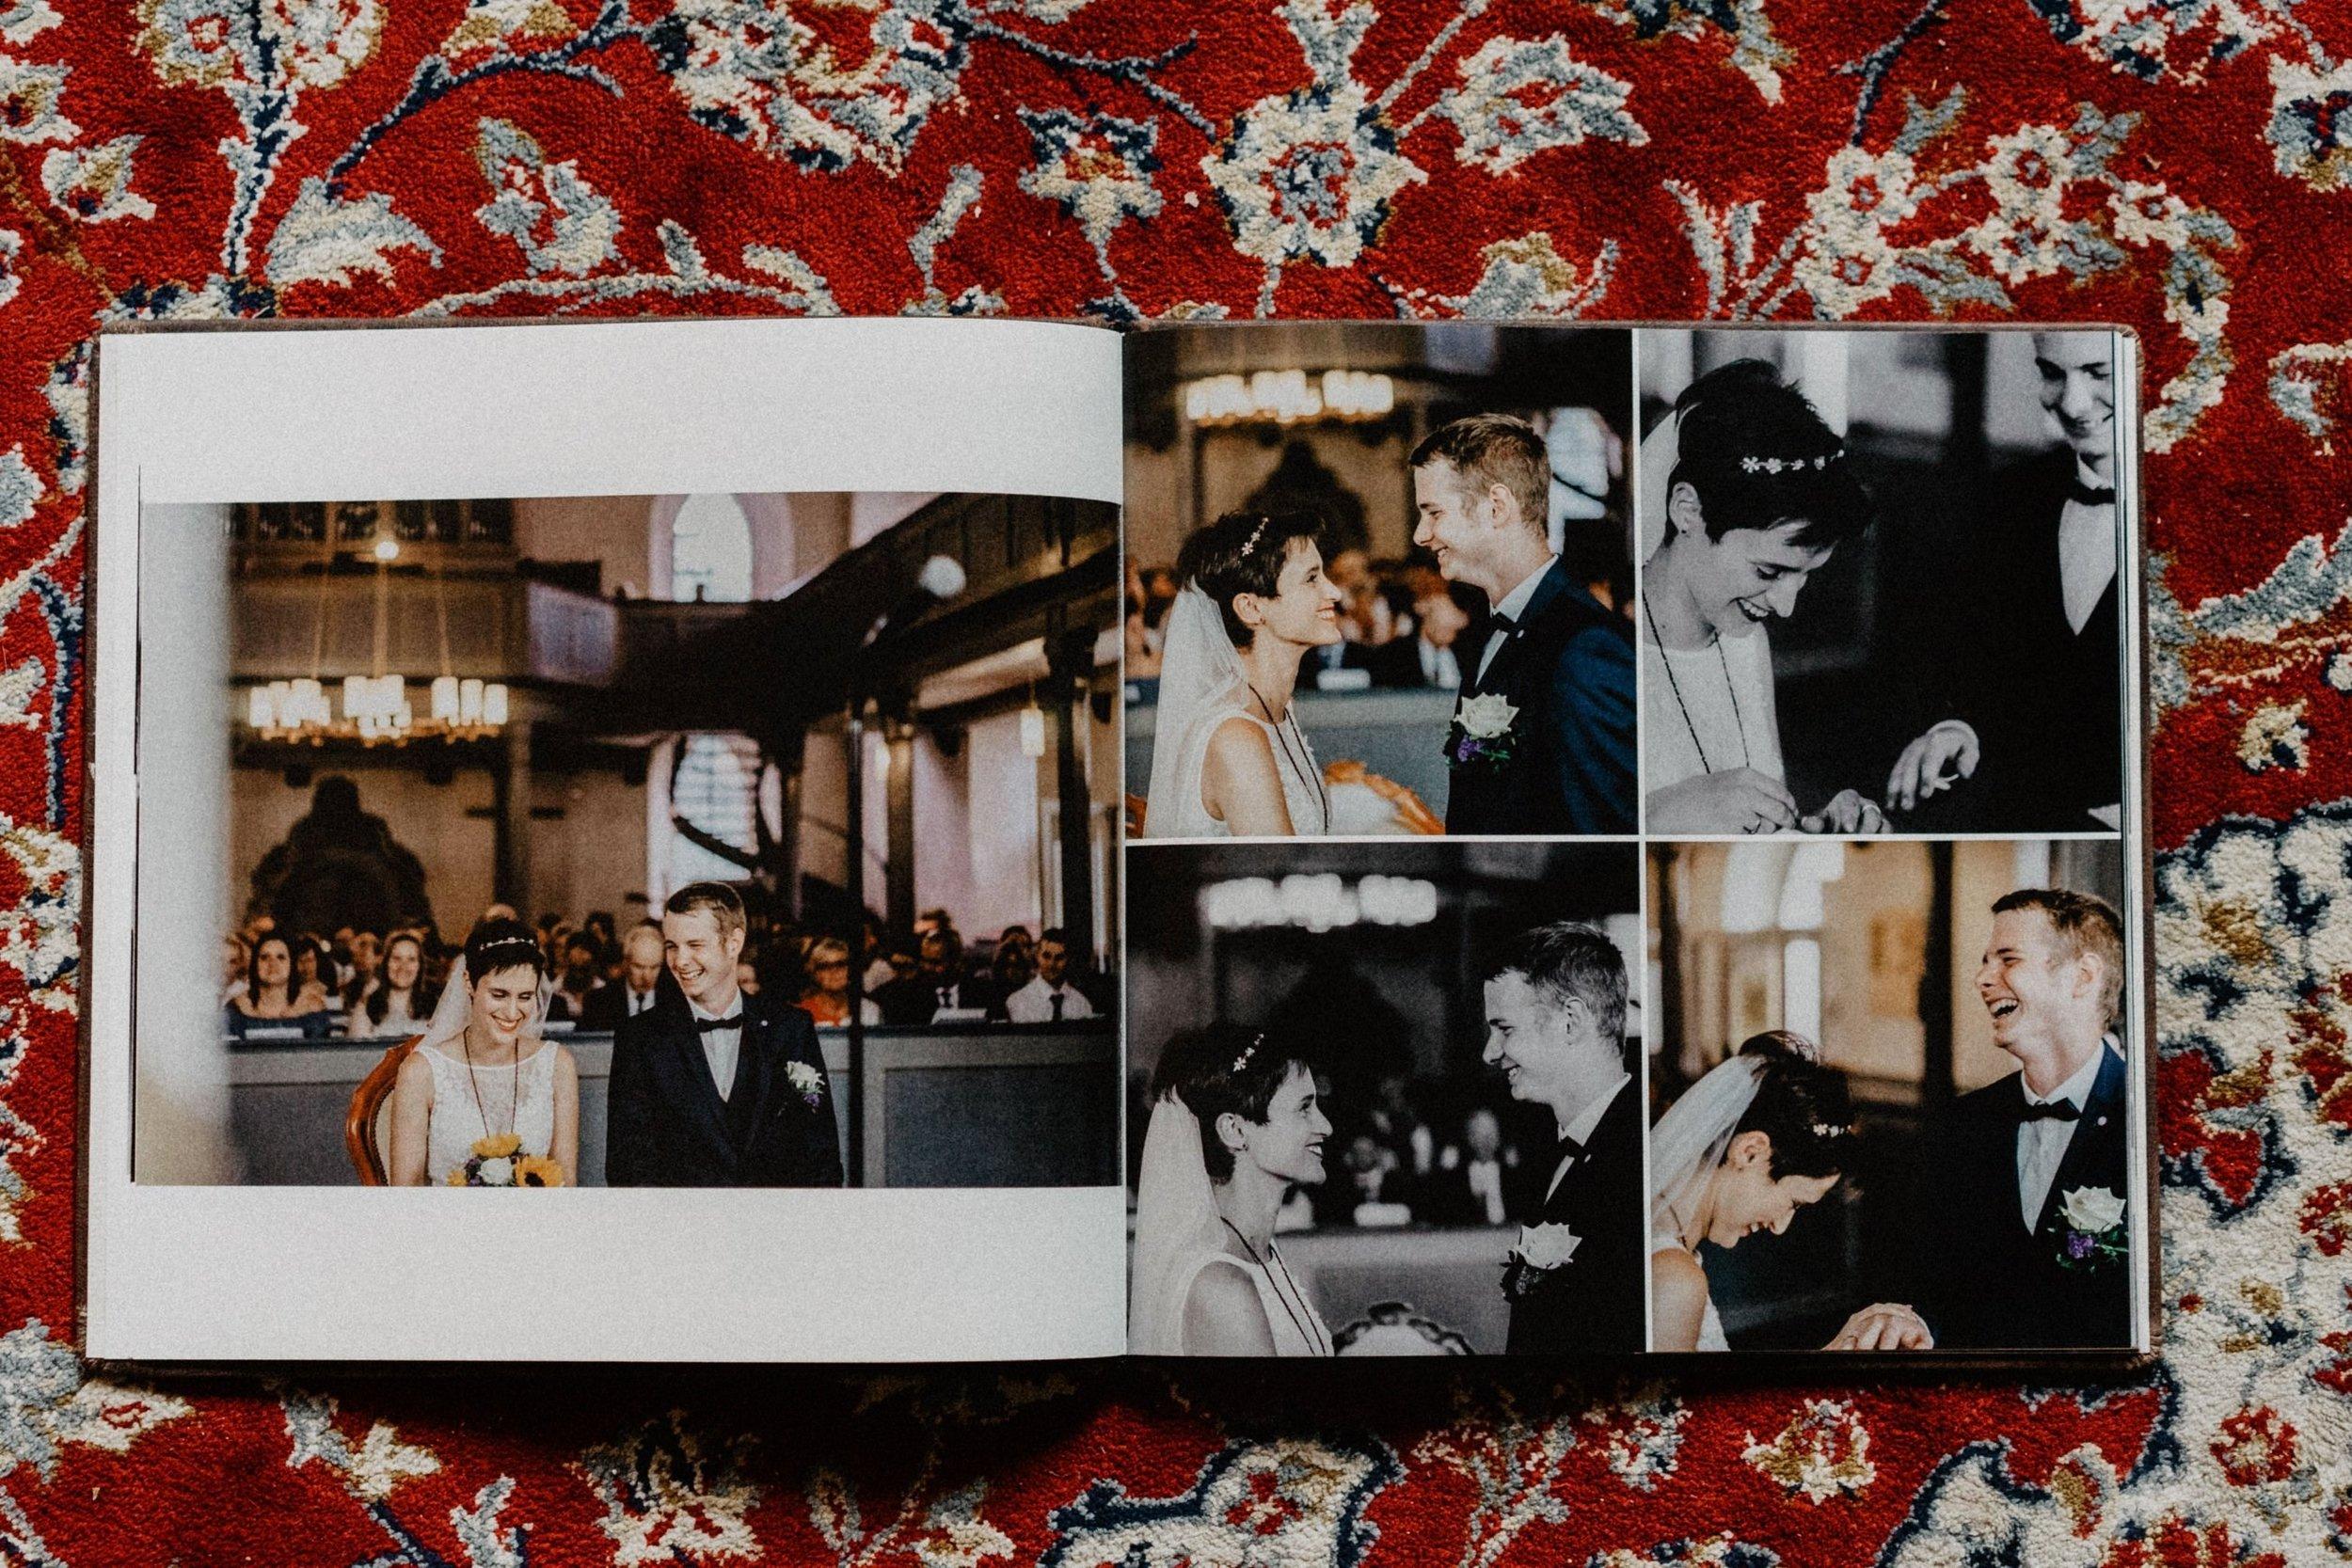 erikwinter-wedding-album